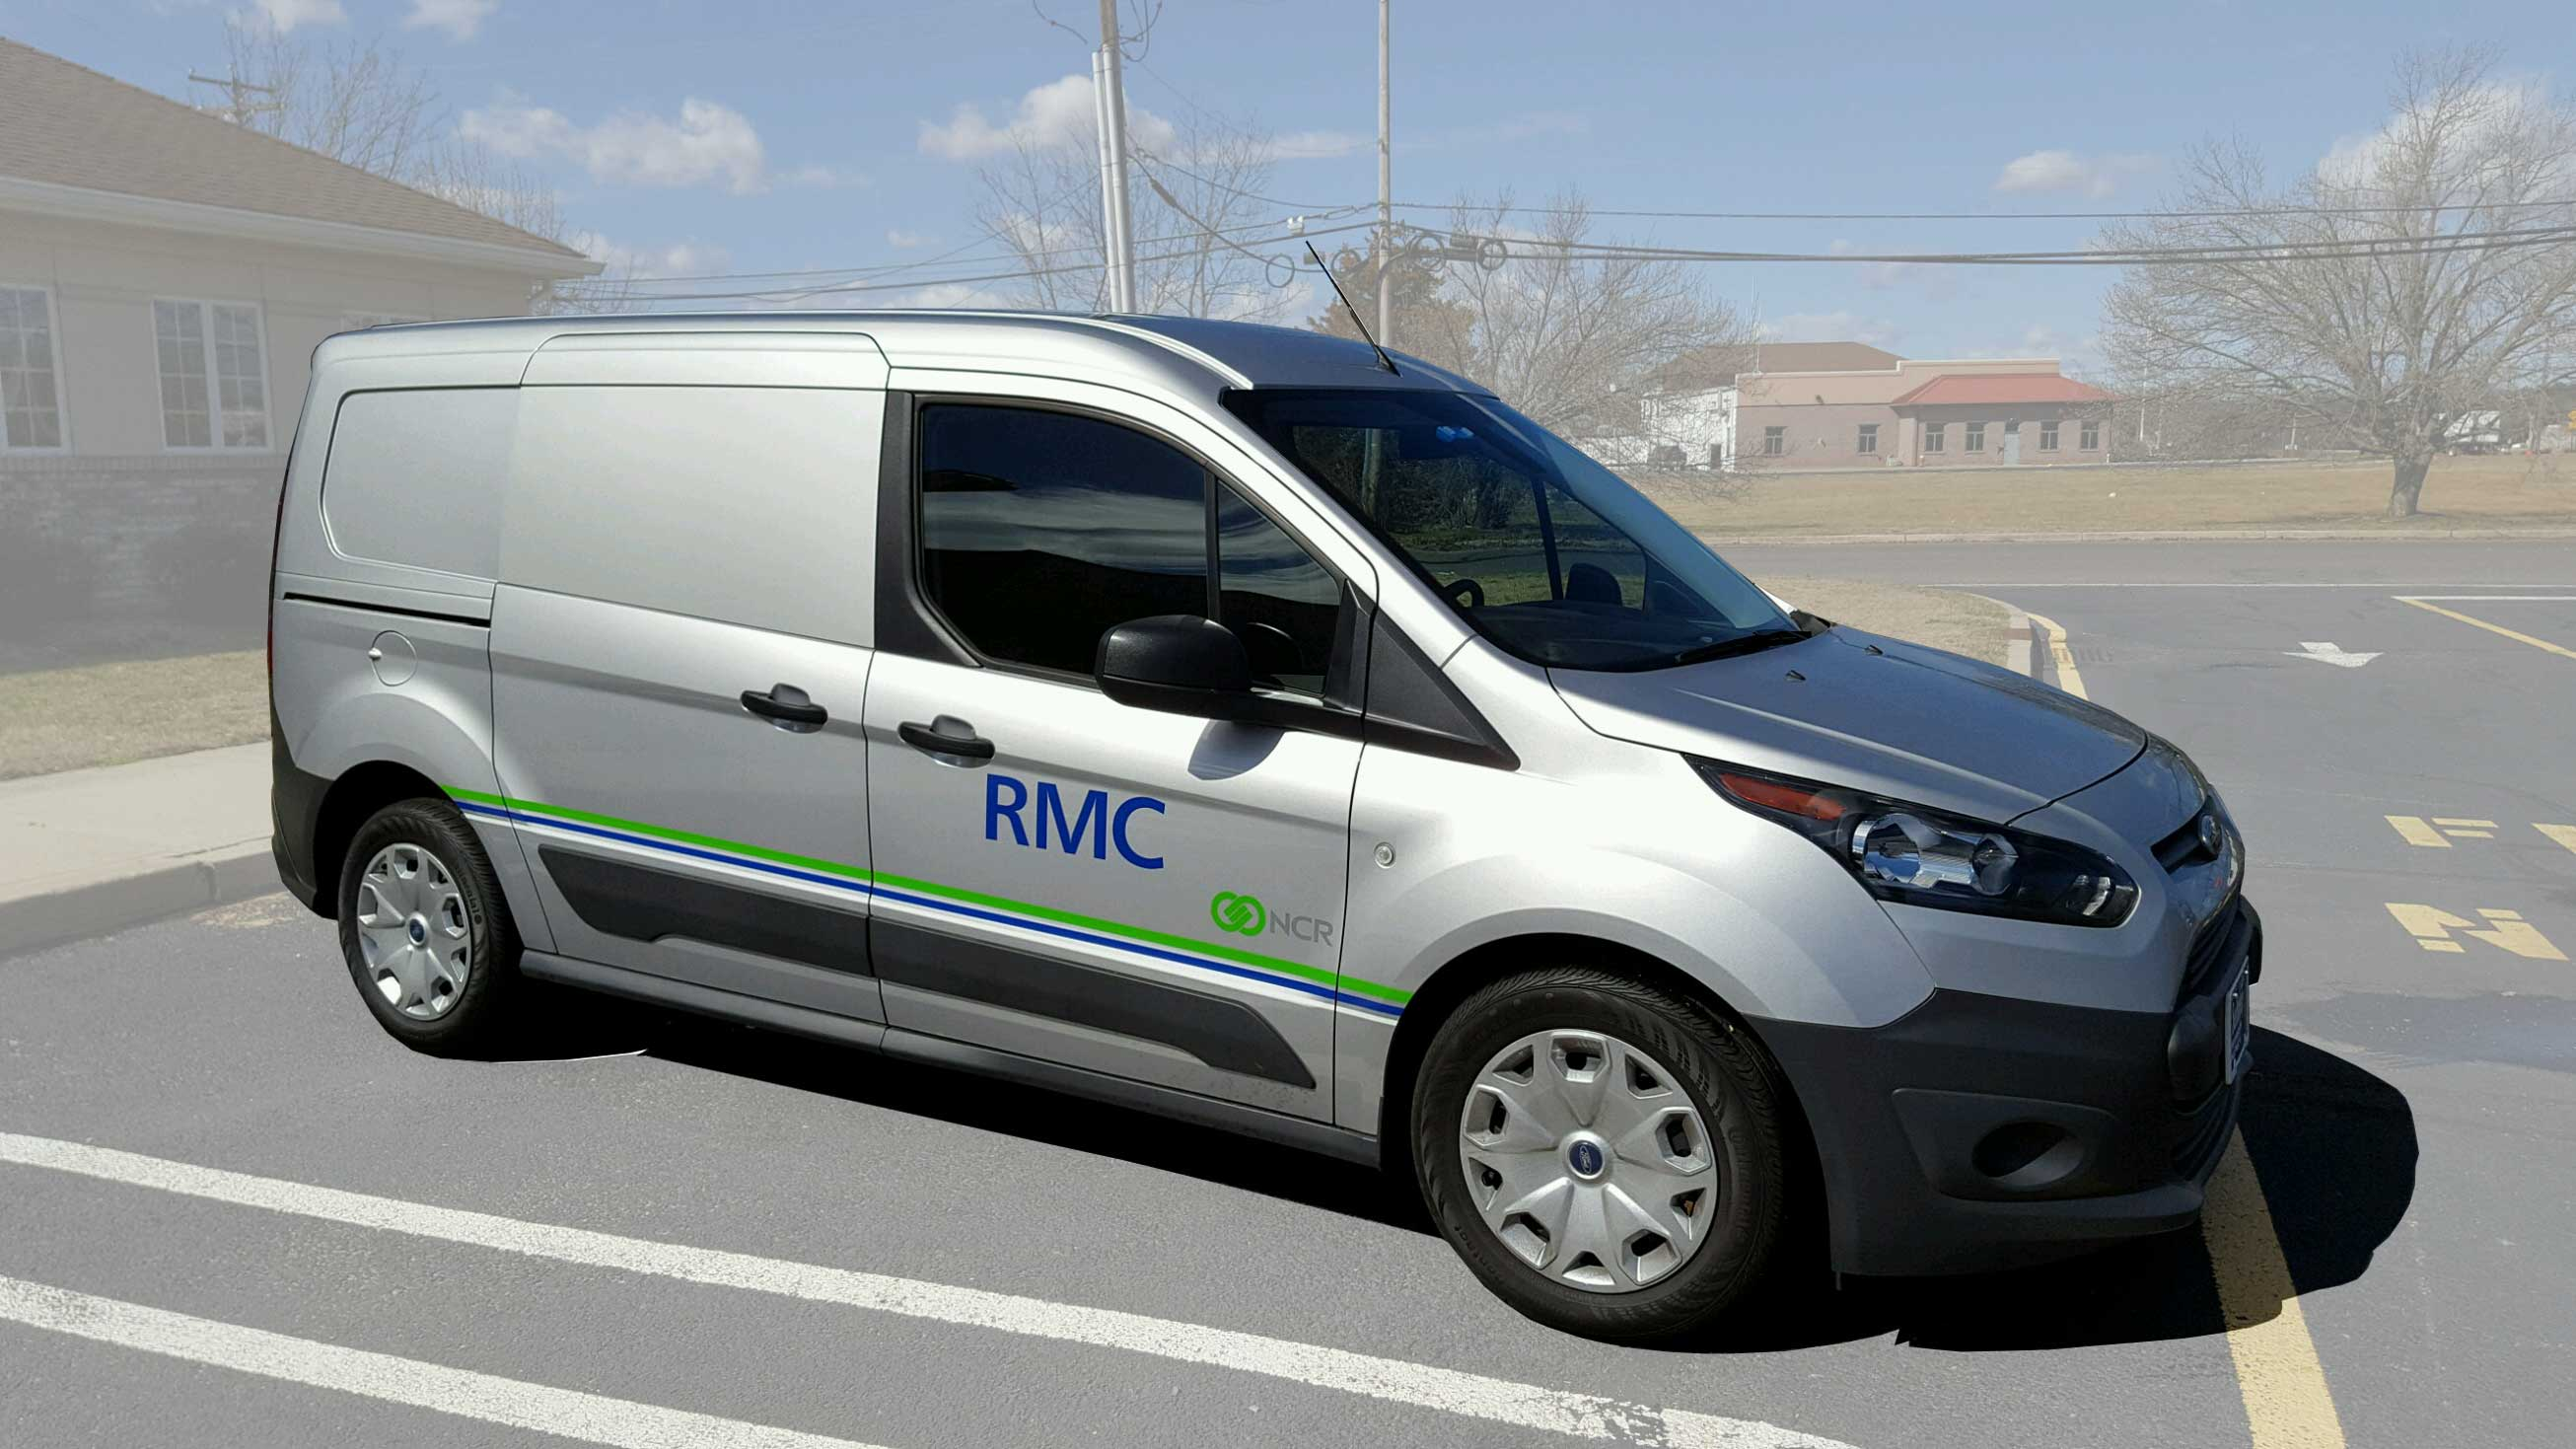 NCR service company, RMC service van